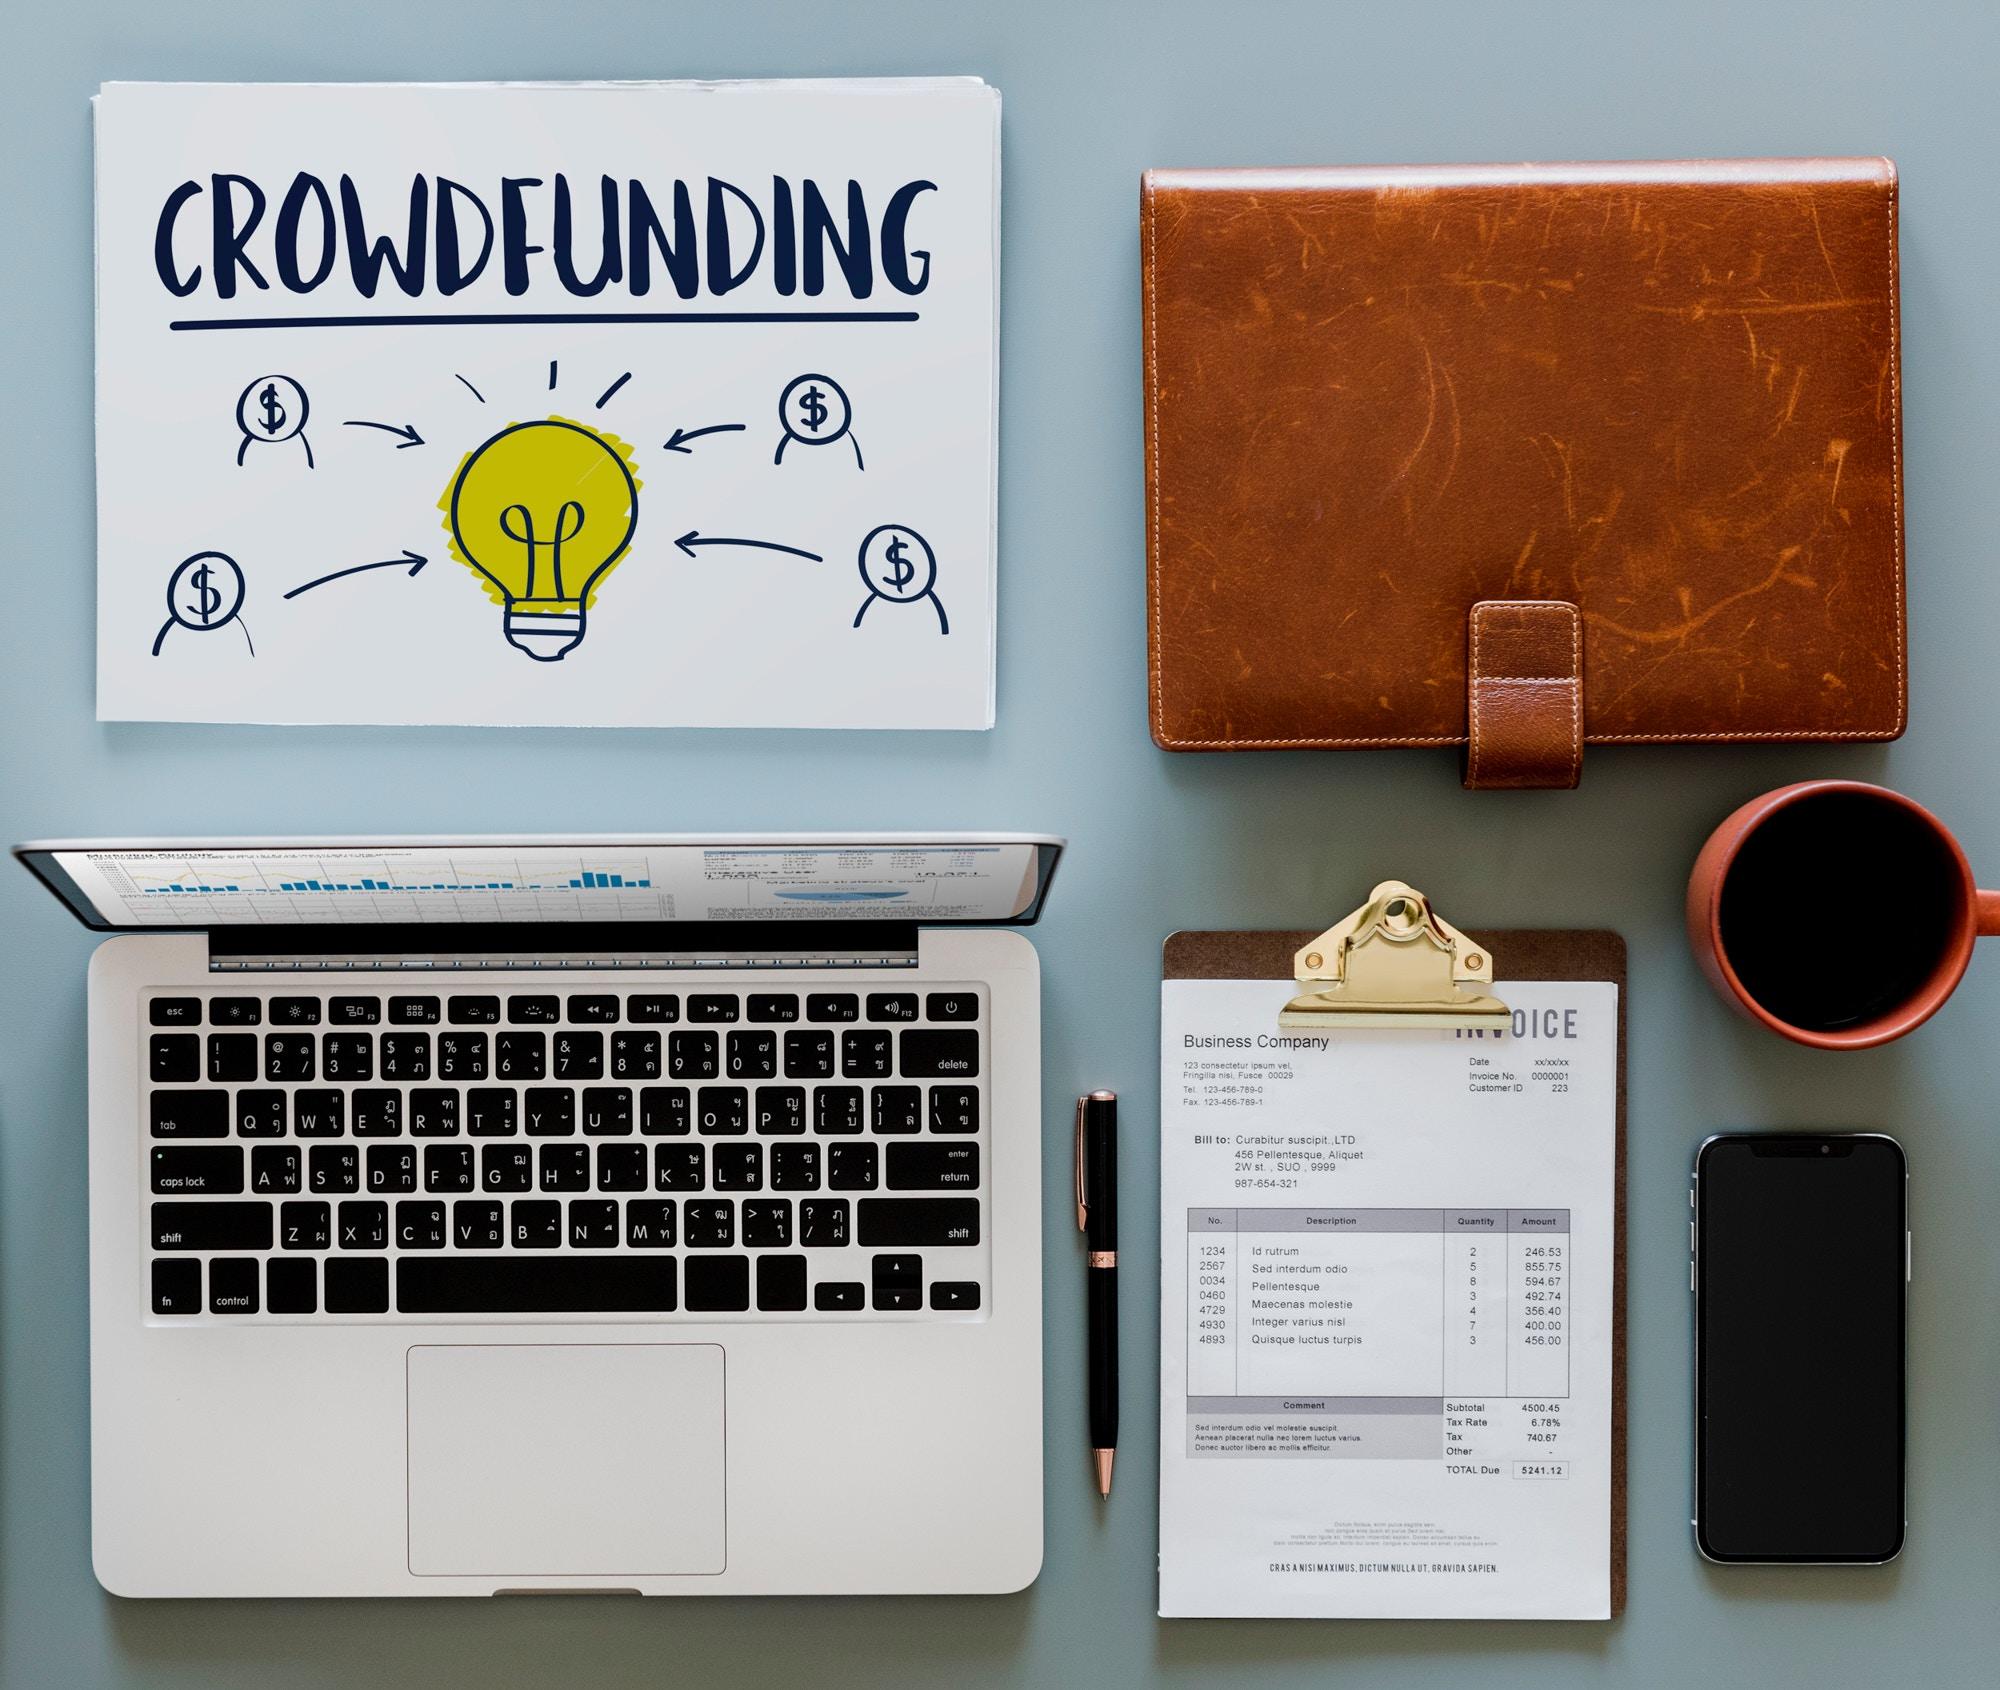 crowdfunding-guide.jpg